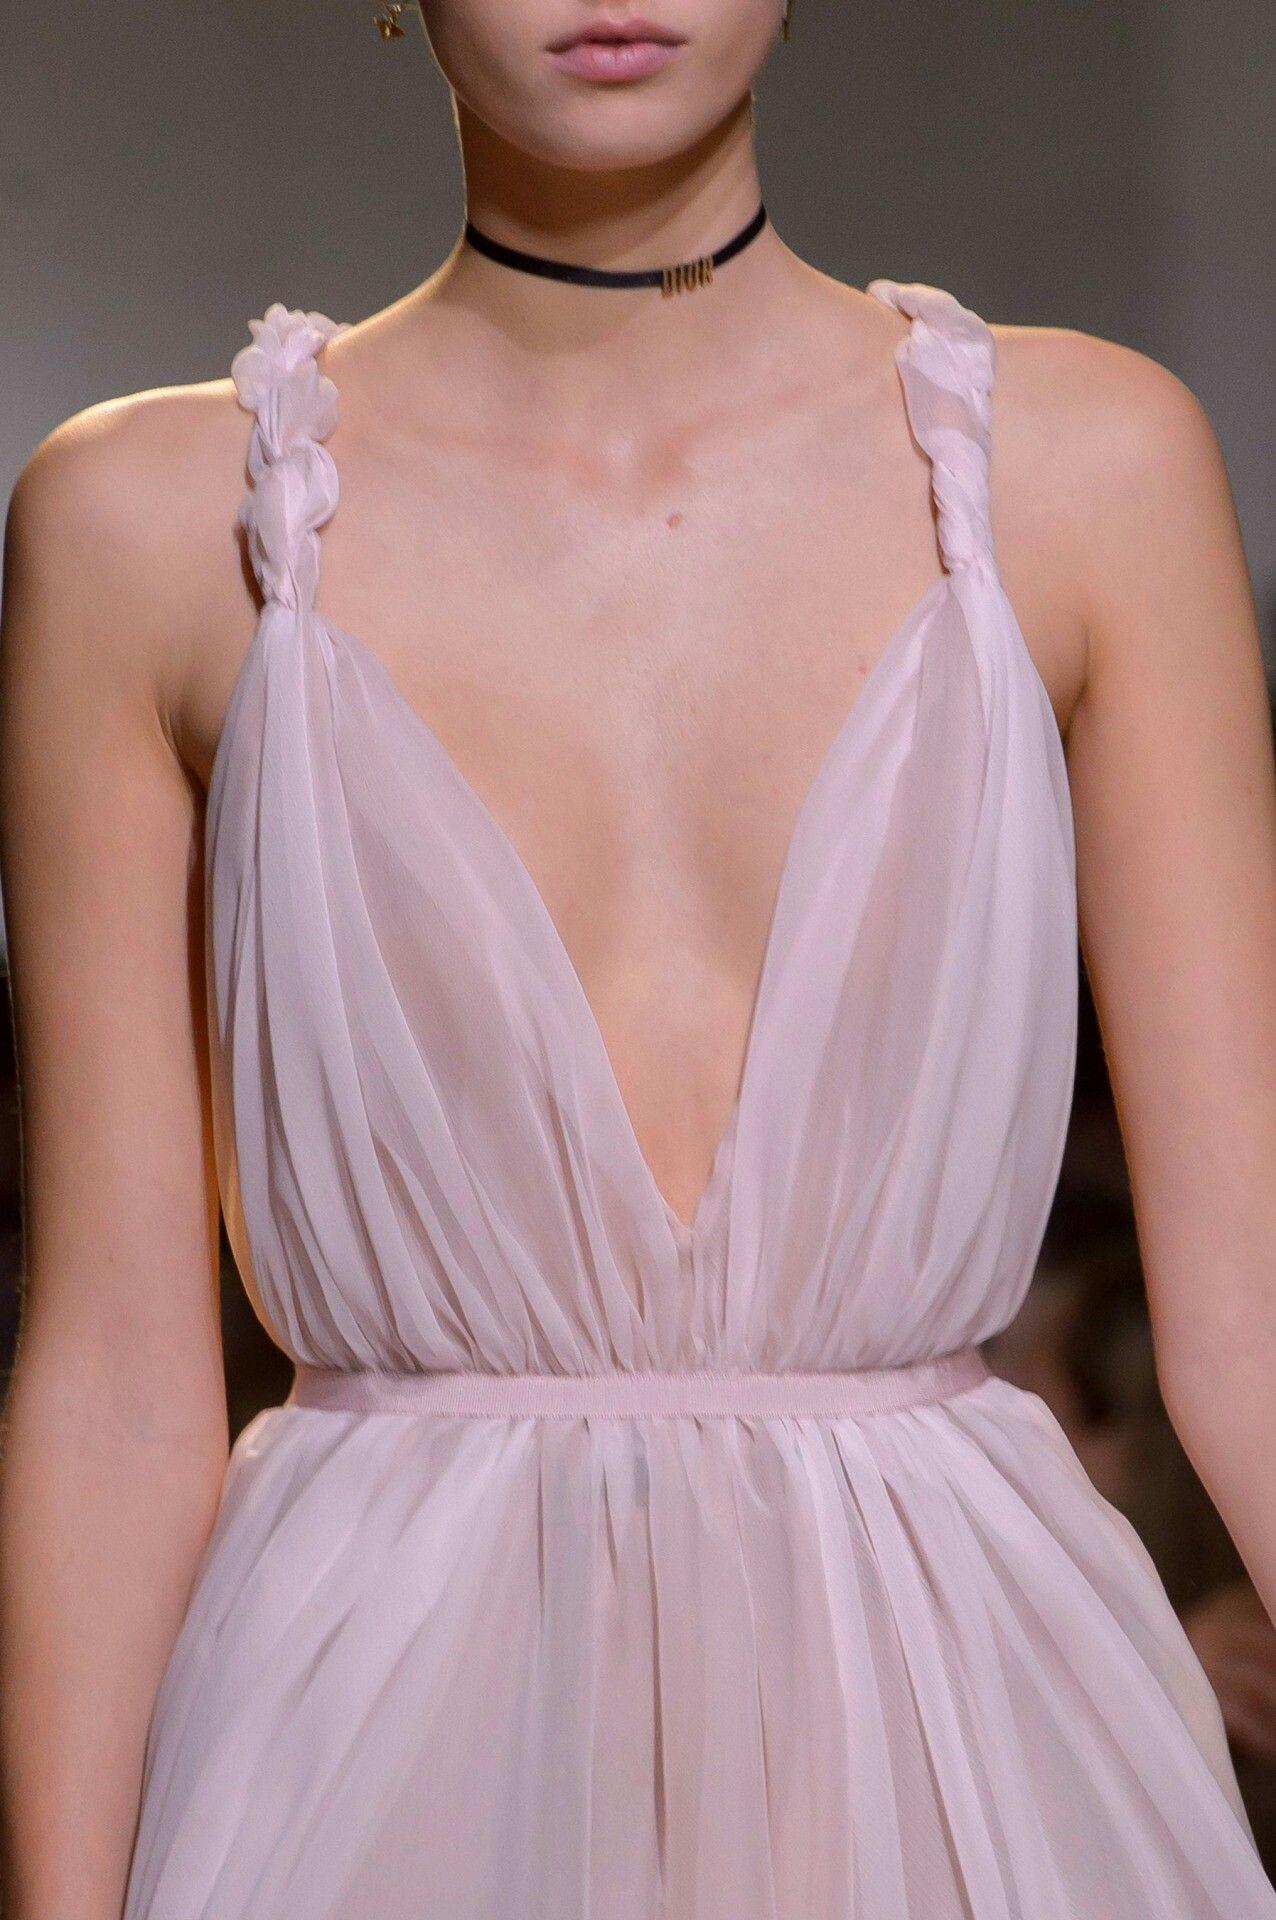 Pin de Julz Sher en Vestidos de novia | Pinterest | Vestidos de ...